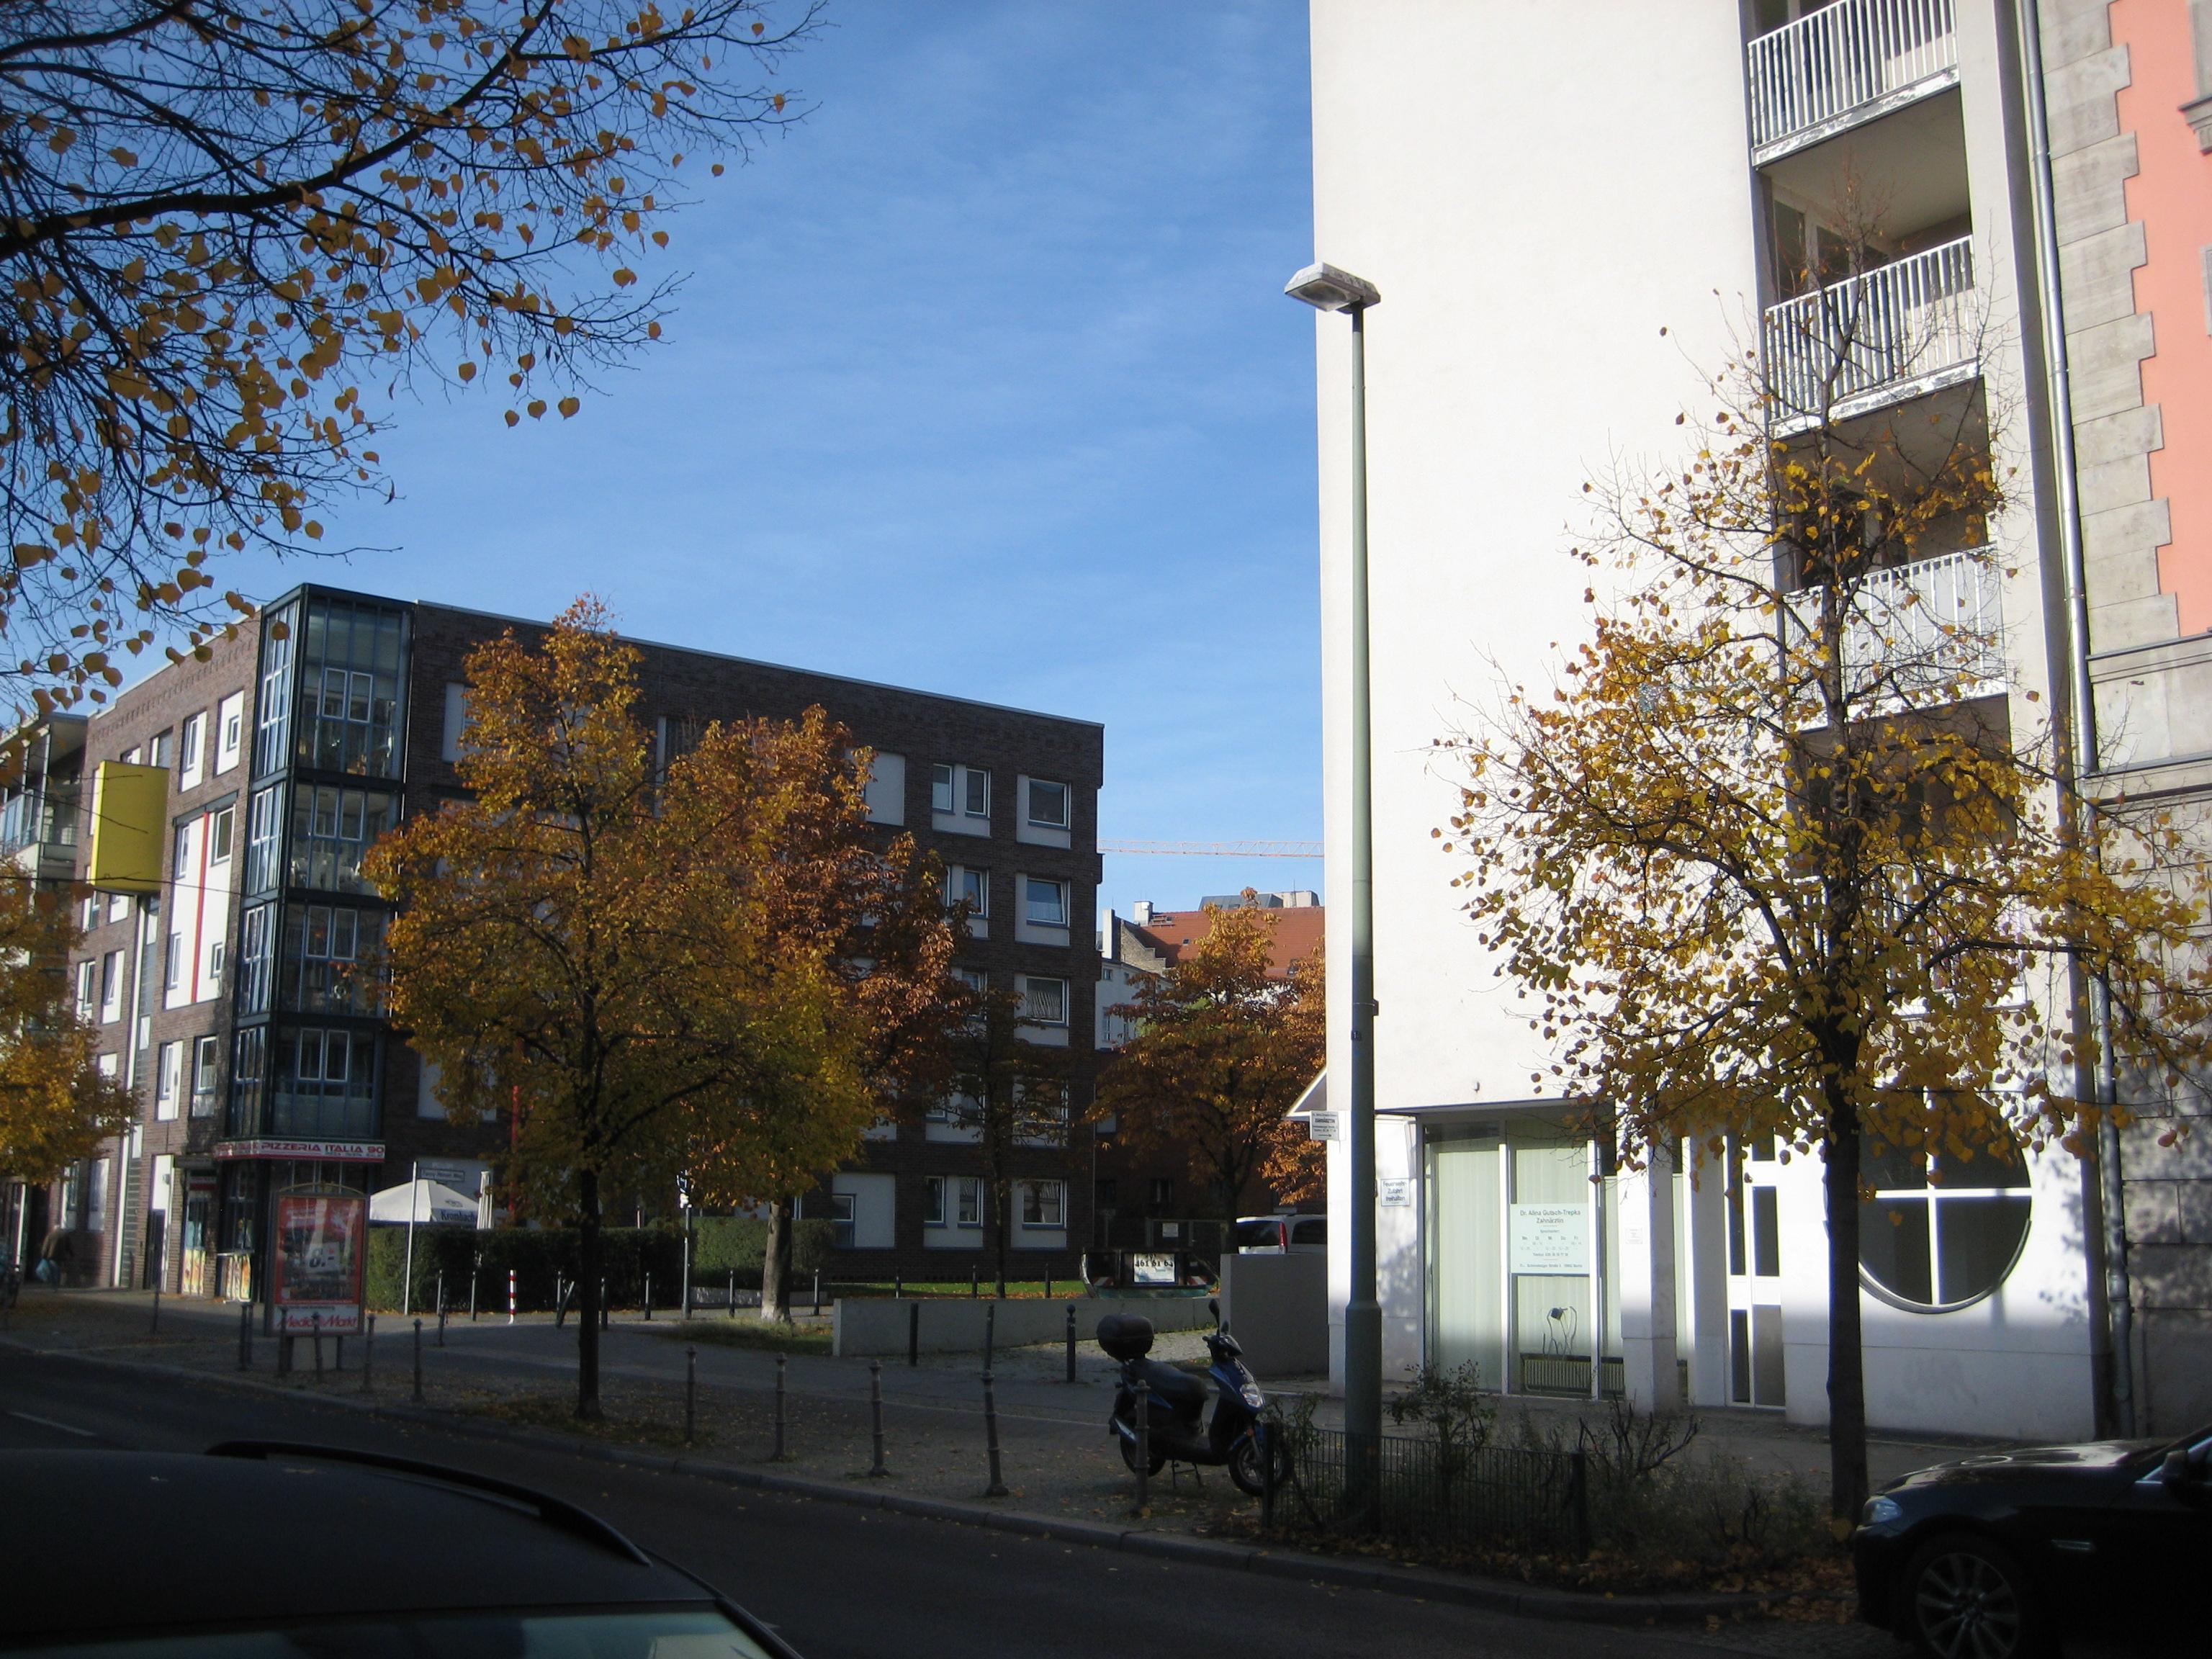 File:Berlin, Schöneberger Str, 2015 (Spezialsalzsyndikate ...